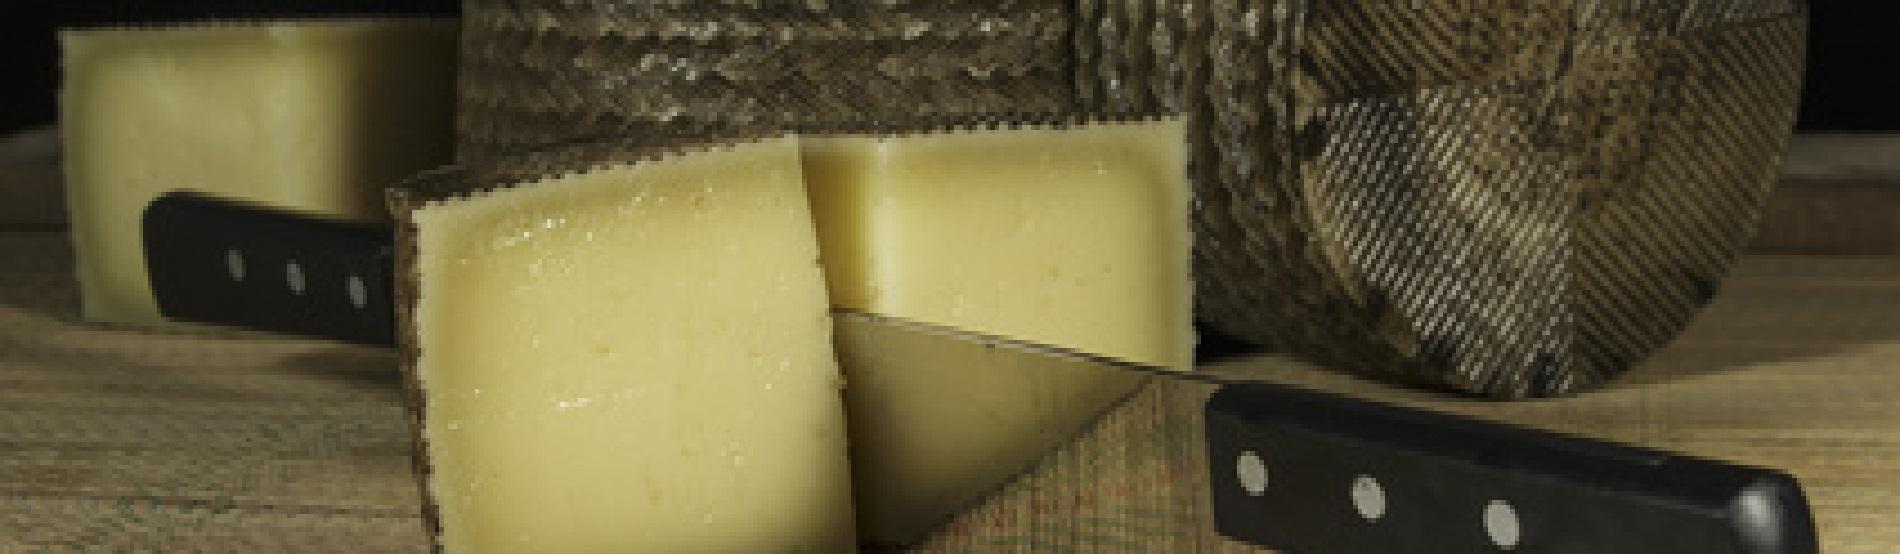 Spanischer Käse